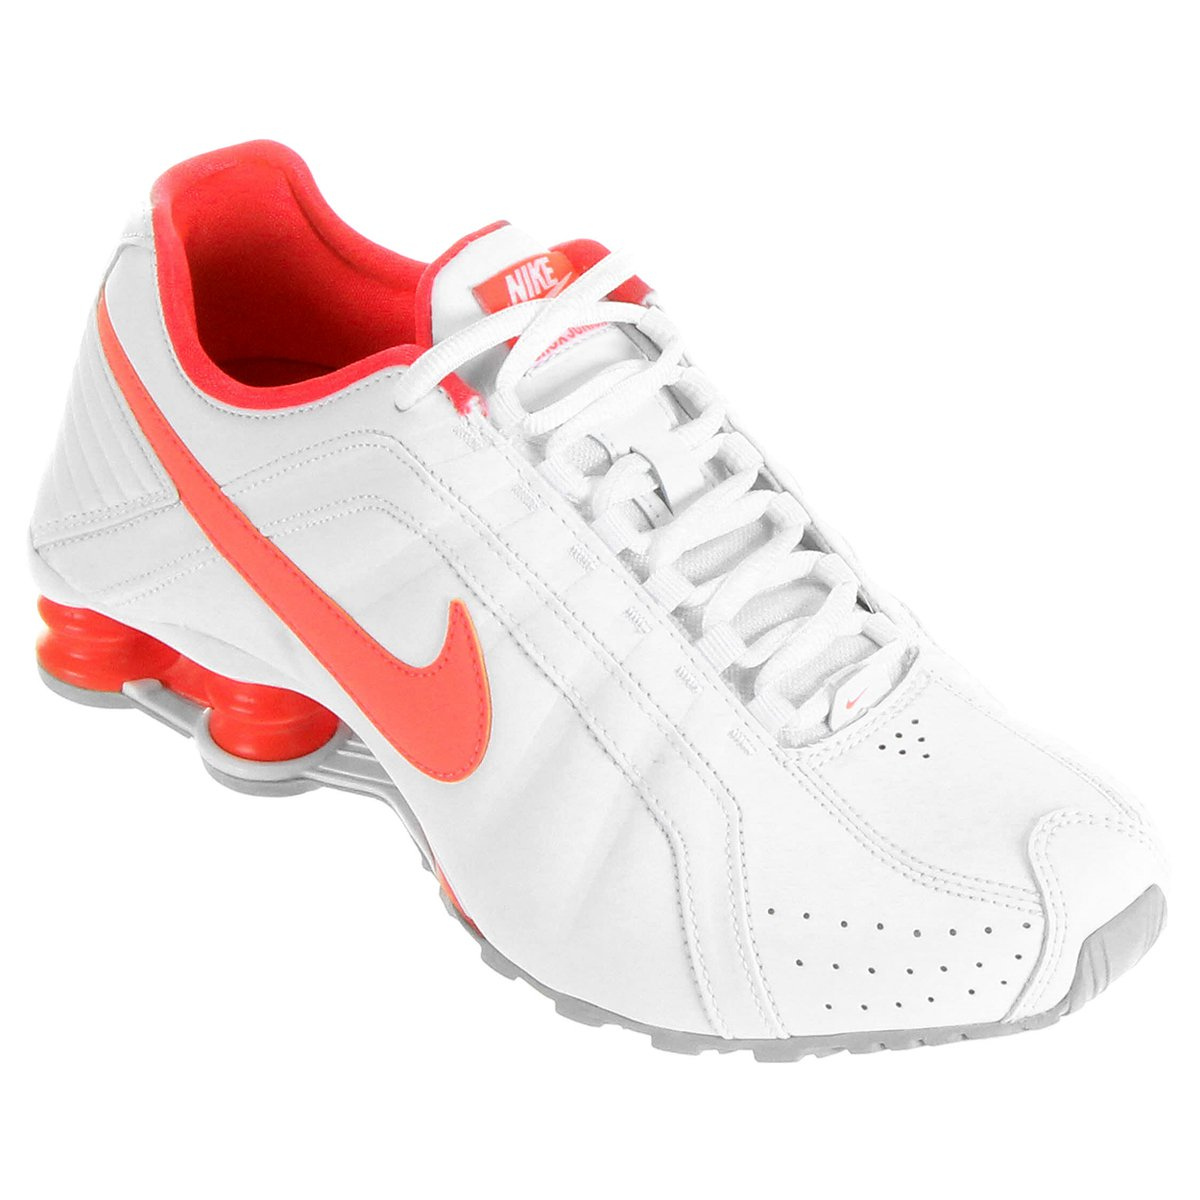 cheap for discount 73d7f e612c ... inexpensive tênis nike shox junior compre agora netshoes 61c75 a0fe6